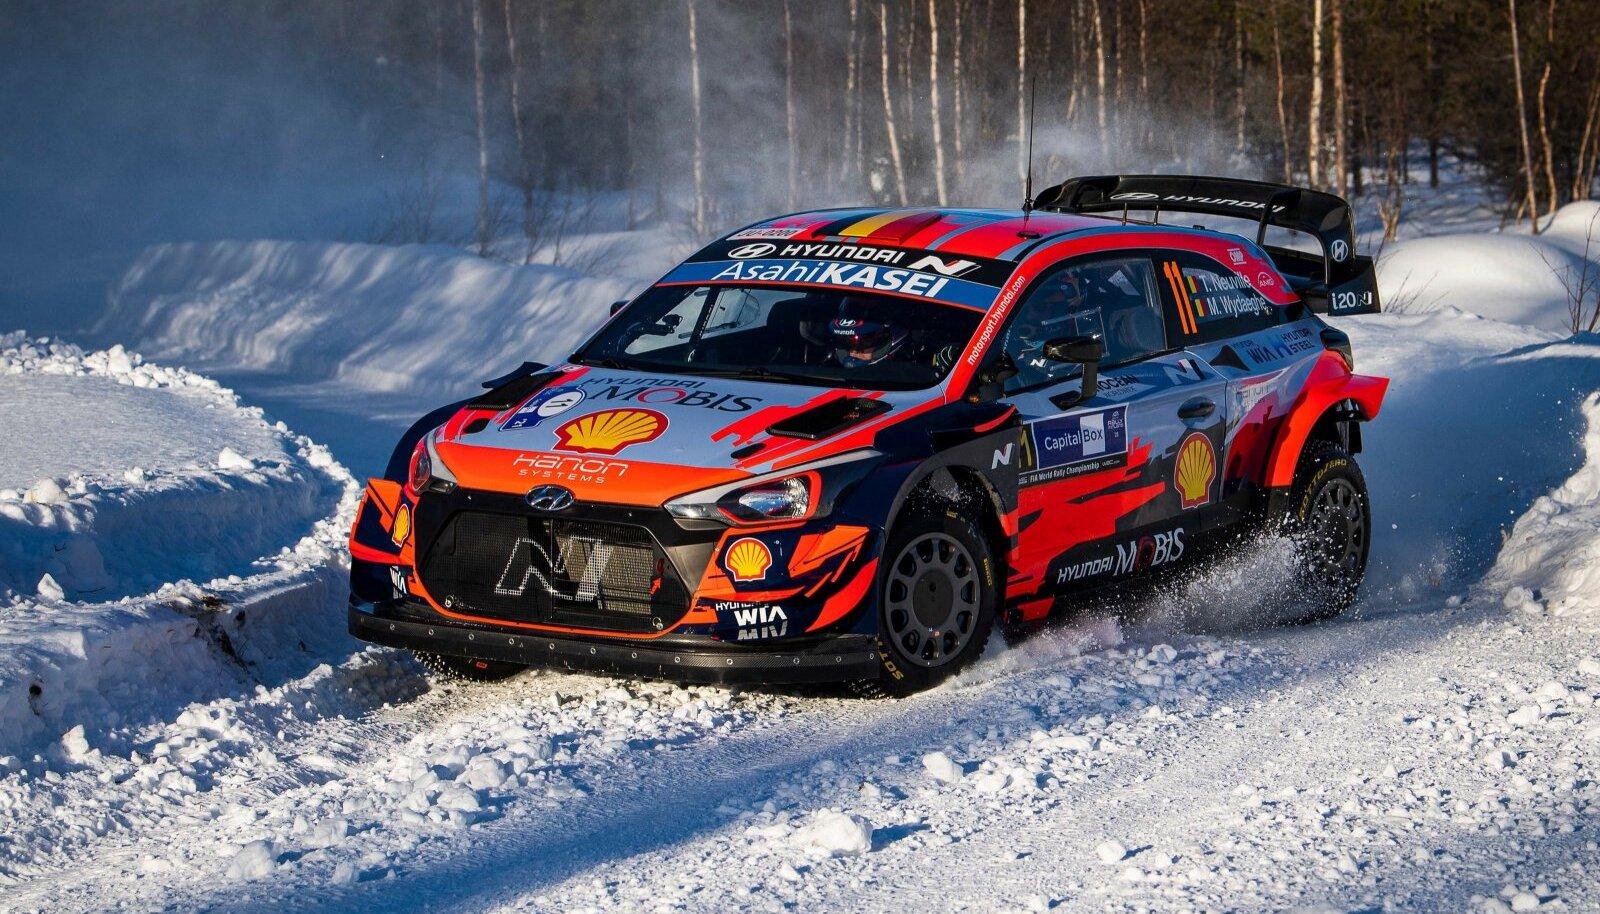 Auto: World rally championship (WRC), Arctic Rally